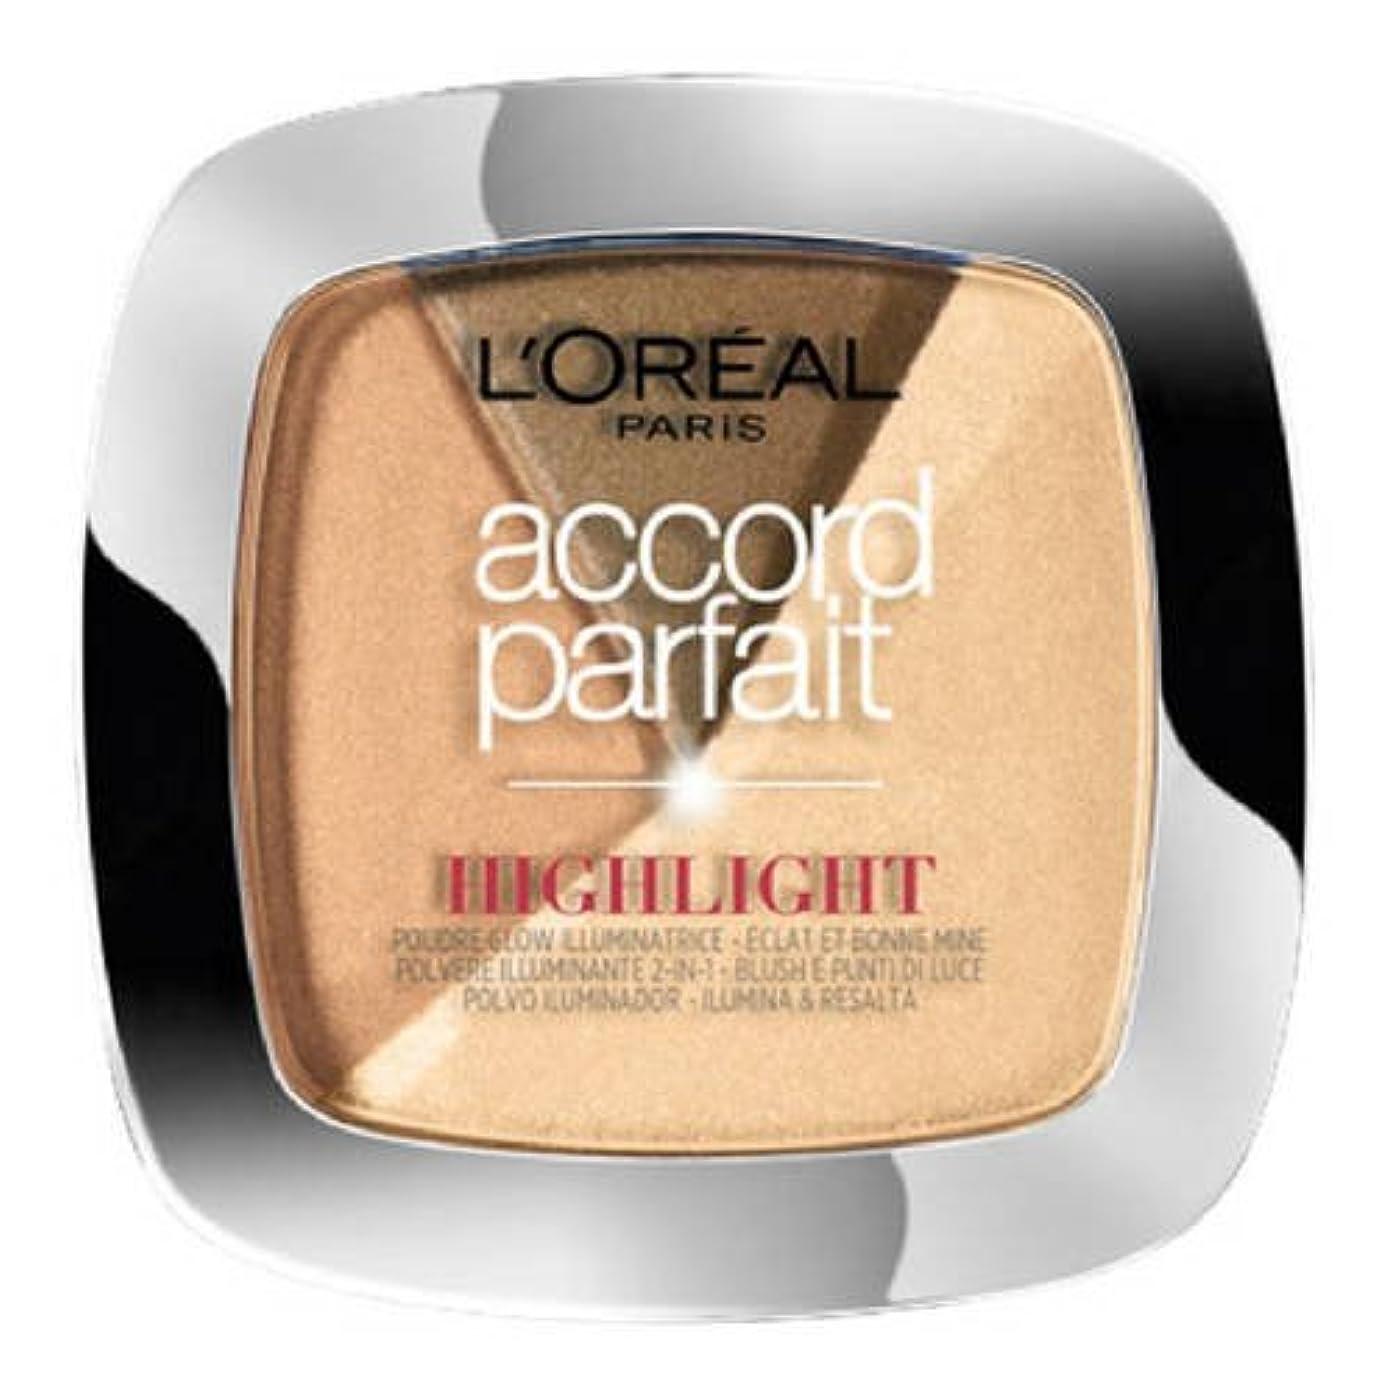 最大の悪党自分自身L 'Oréal Paris - ACCORD PARFAIT Highlight Enlumineur Poudre - 102 Dore